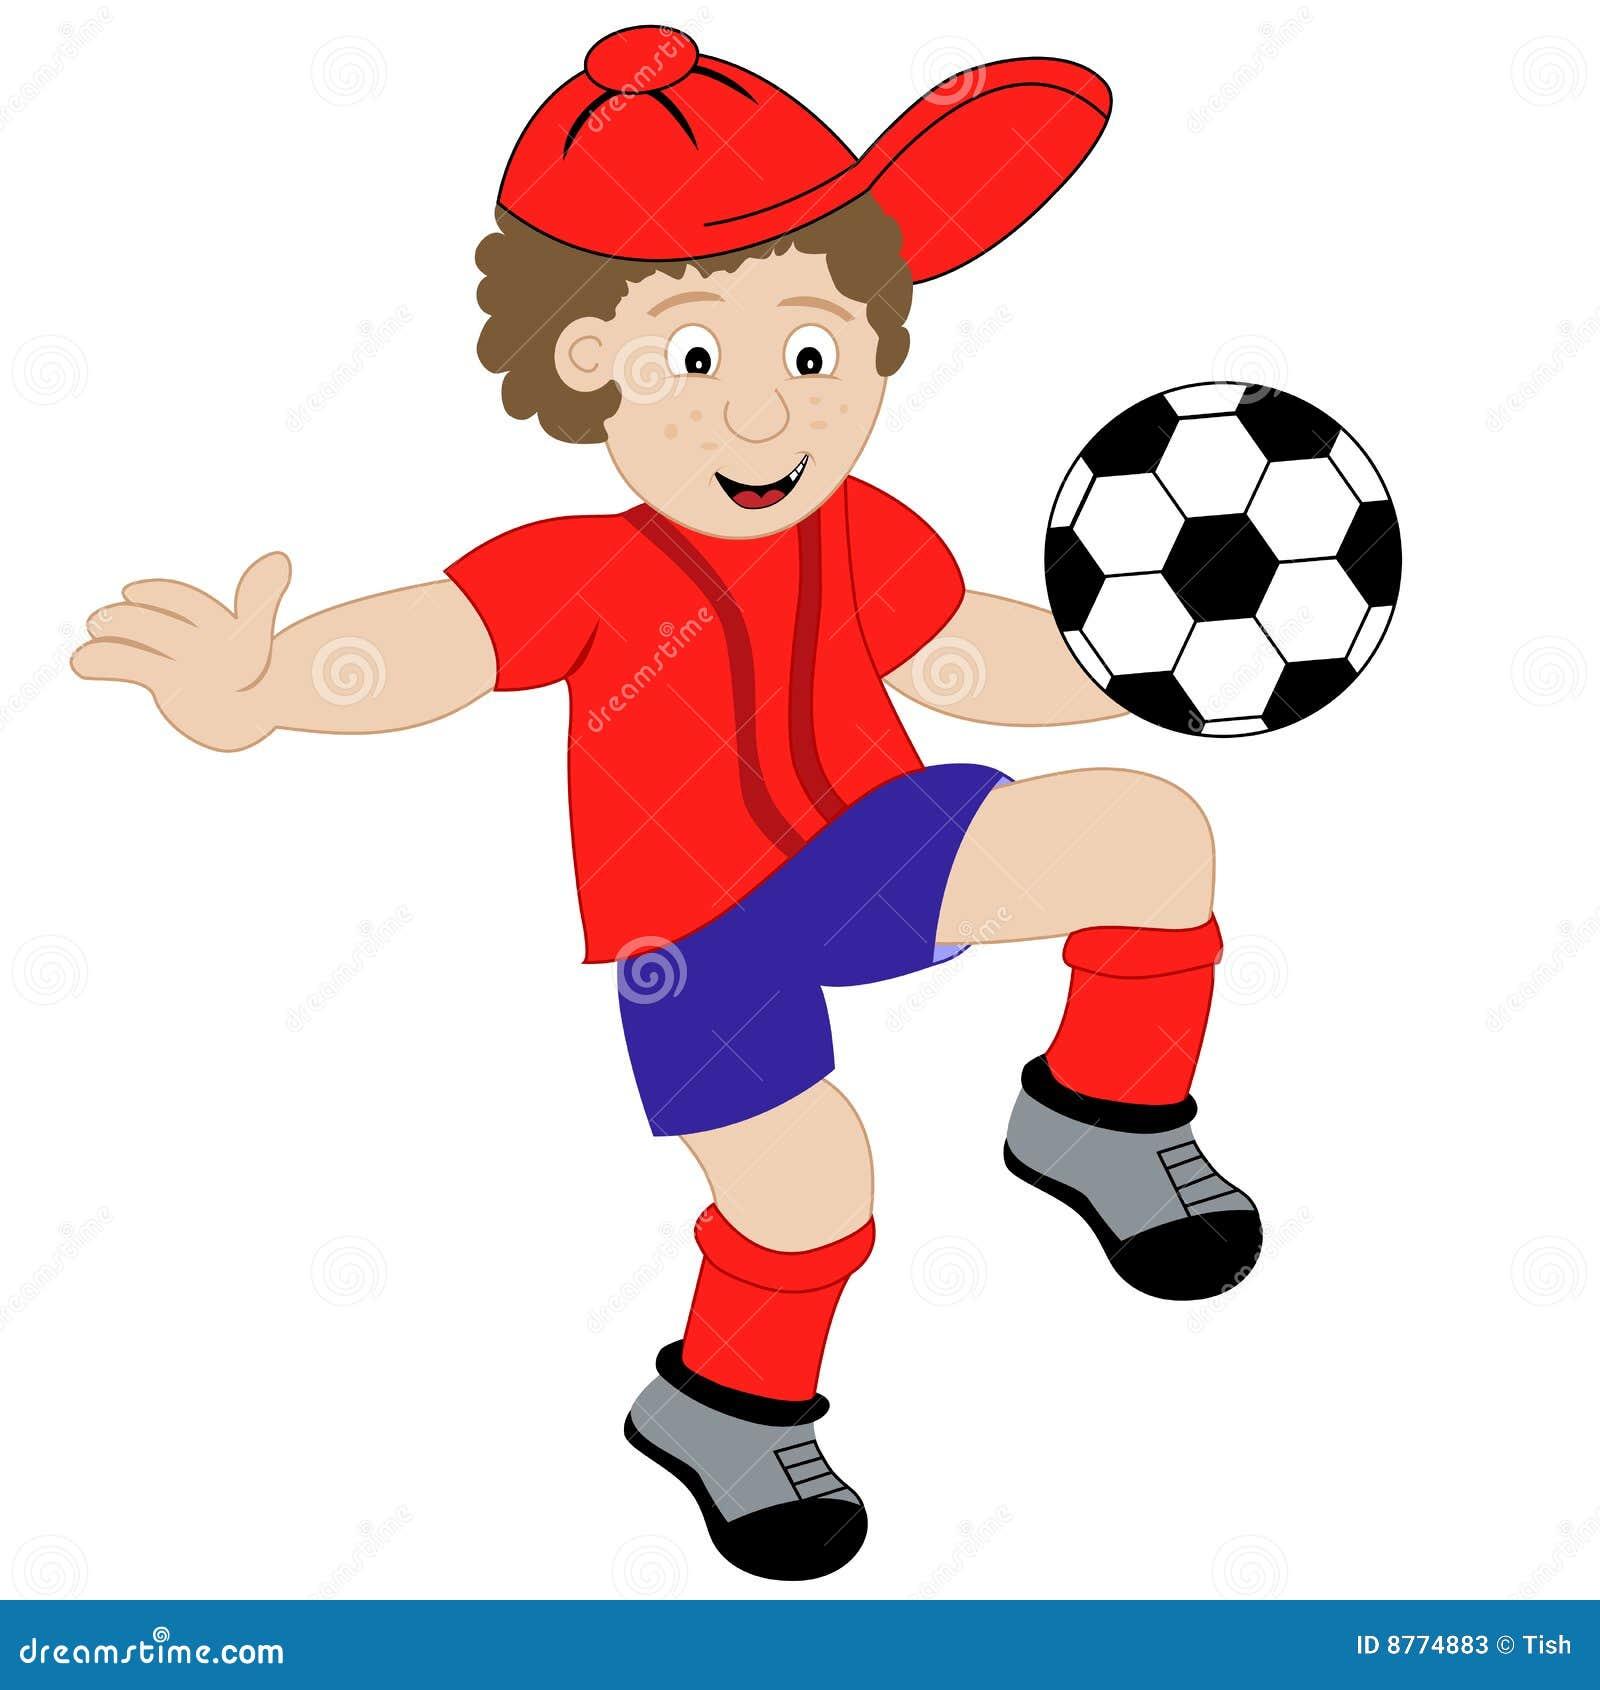 Dessin Anim 9 Ans: Garçon De Dessin Animé Jouant Au Football Illustration De